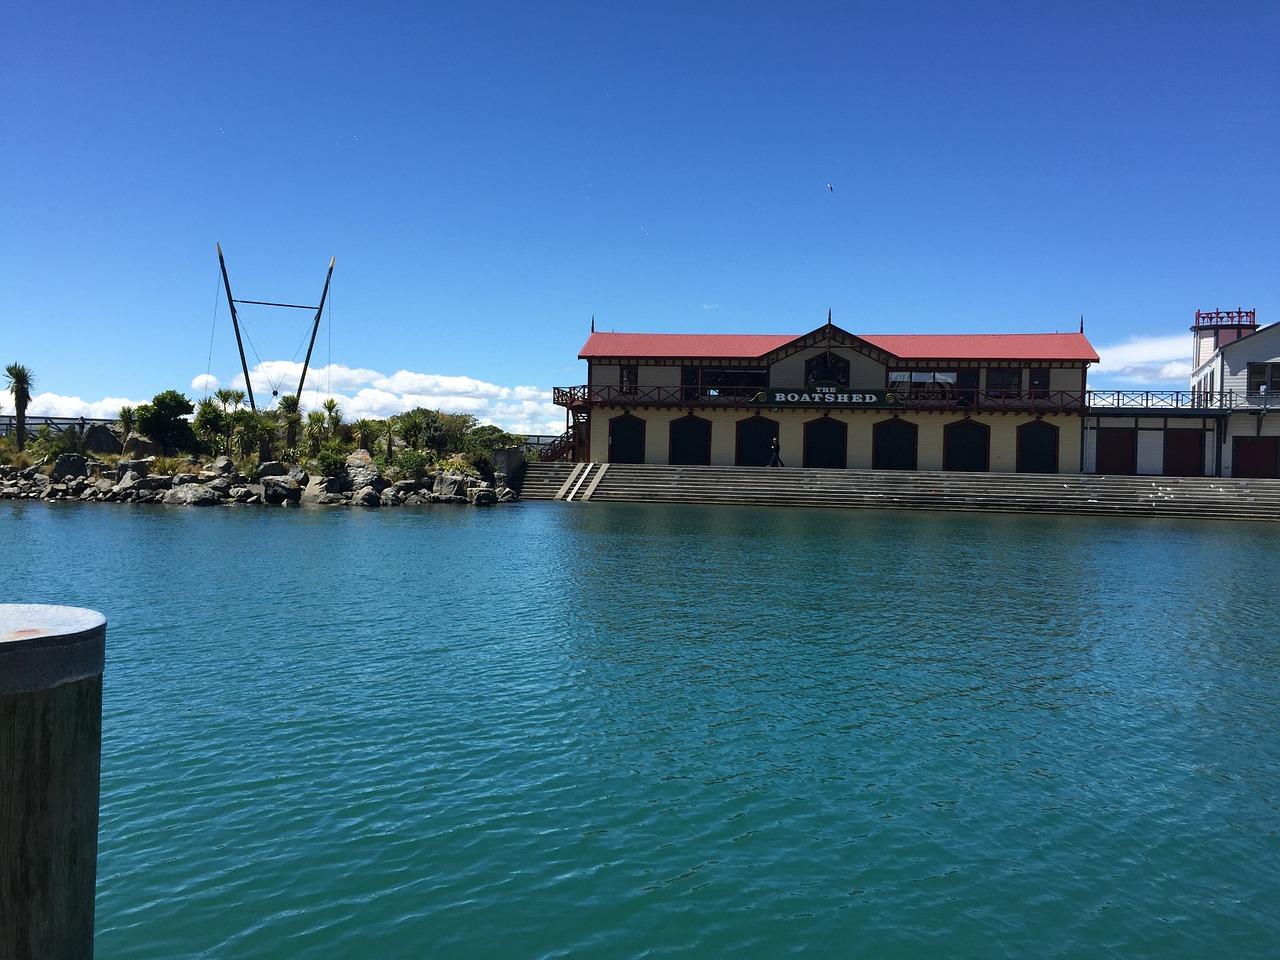 Wellington Waterfront Boat Shed Landmark Building Free